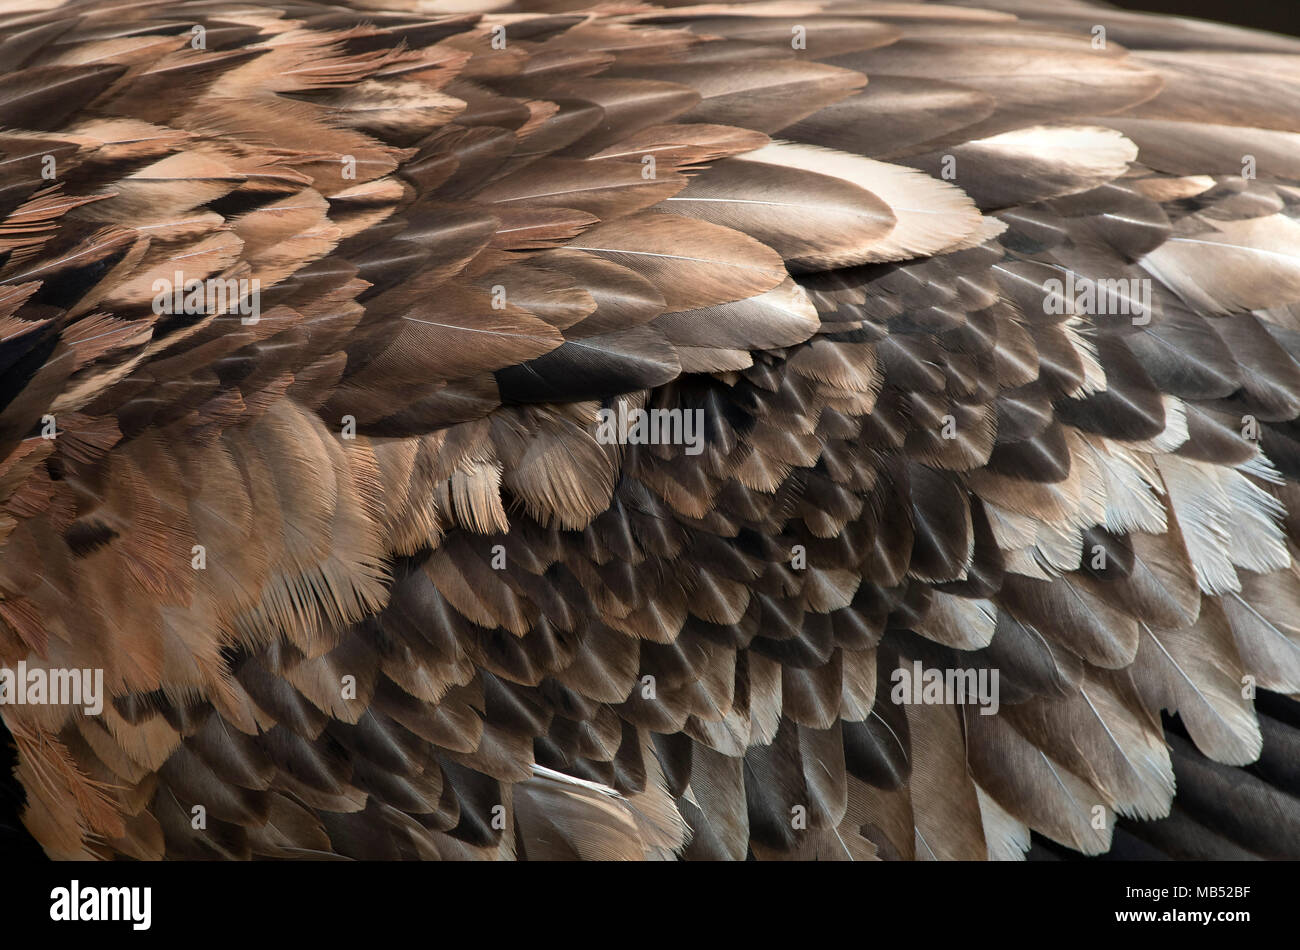 Plumage of Bearded vulture (Gypaetus barbatus), detail, Tyrol, Austria - Stock Image